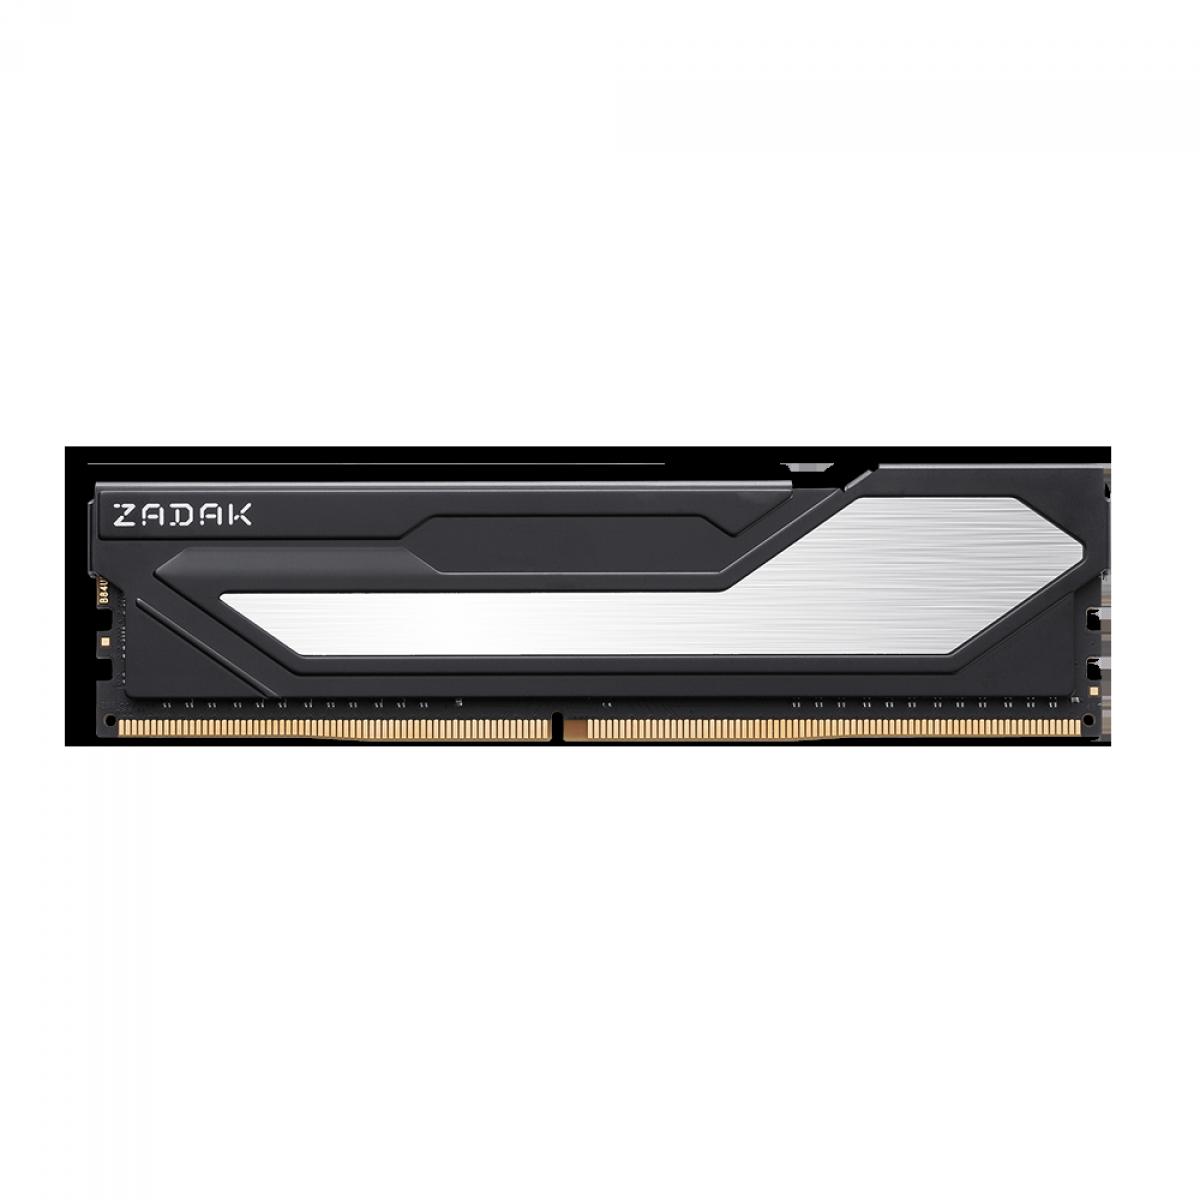 Memória DDR4 Zadak Twist, Black, 8GB, 2666MHz, ZD4-TWS26C08-08GYB1